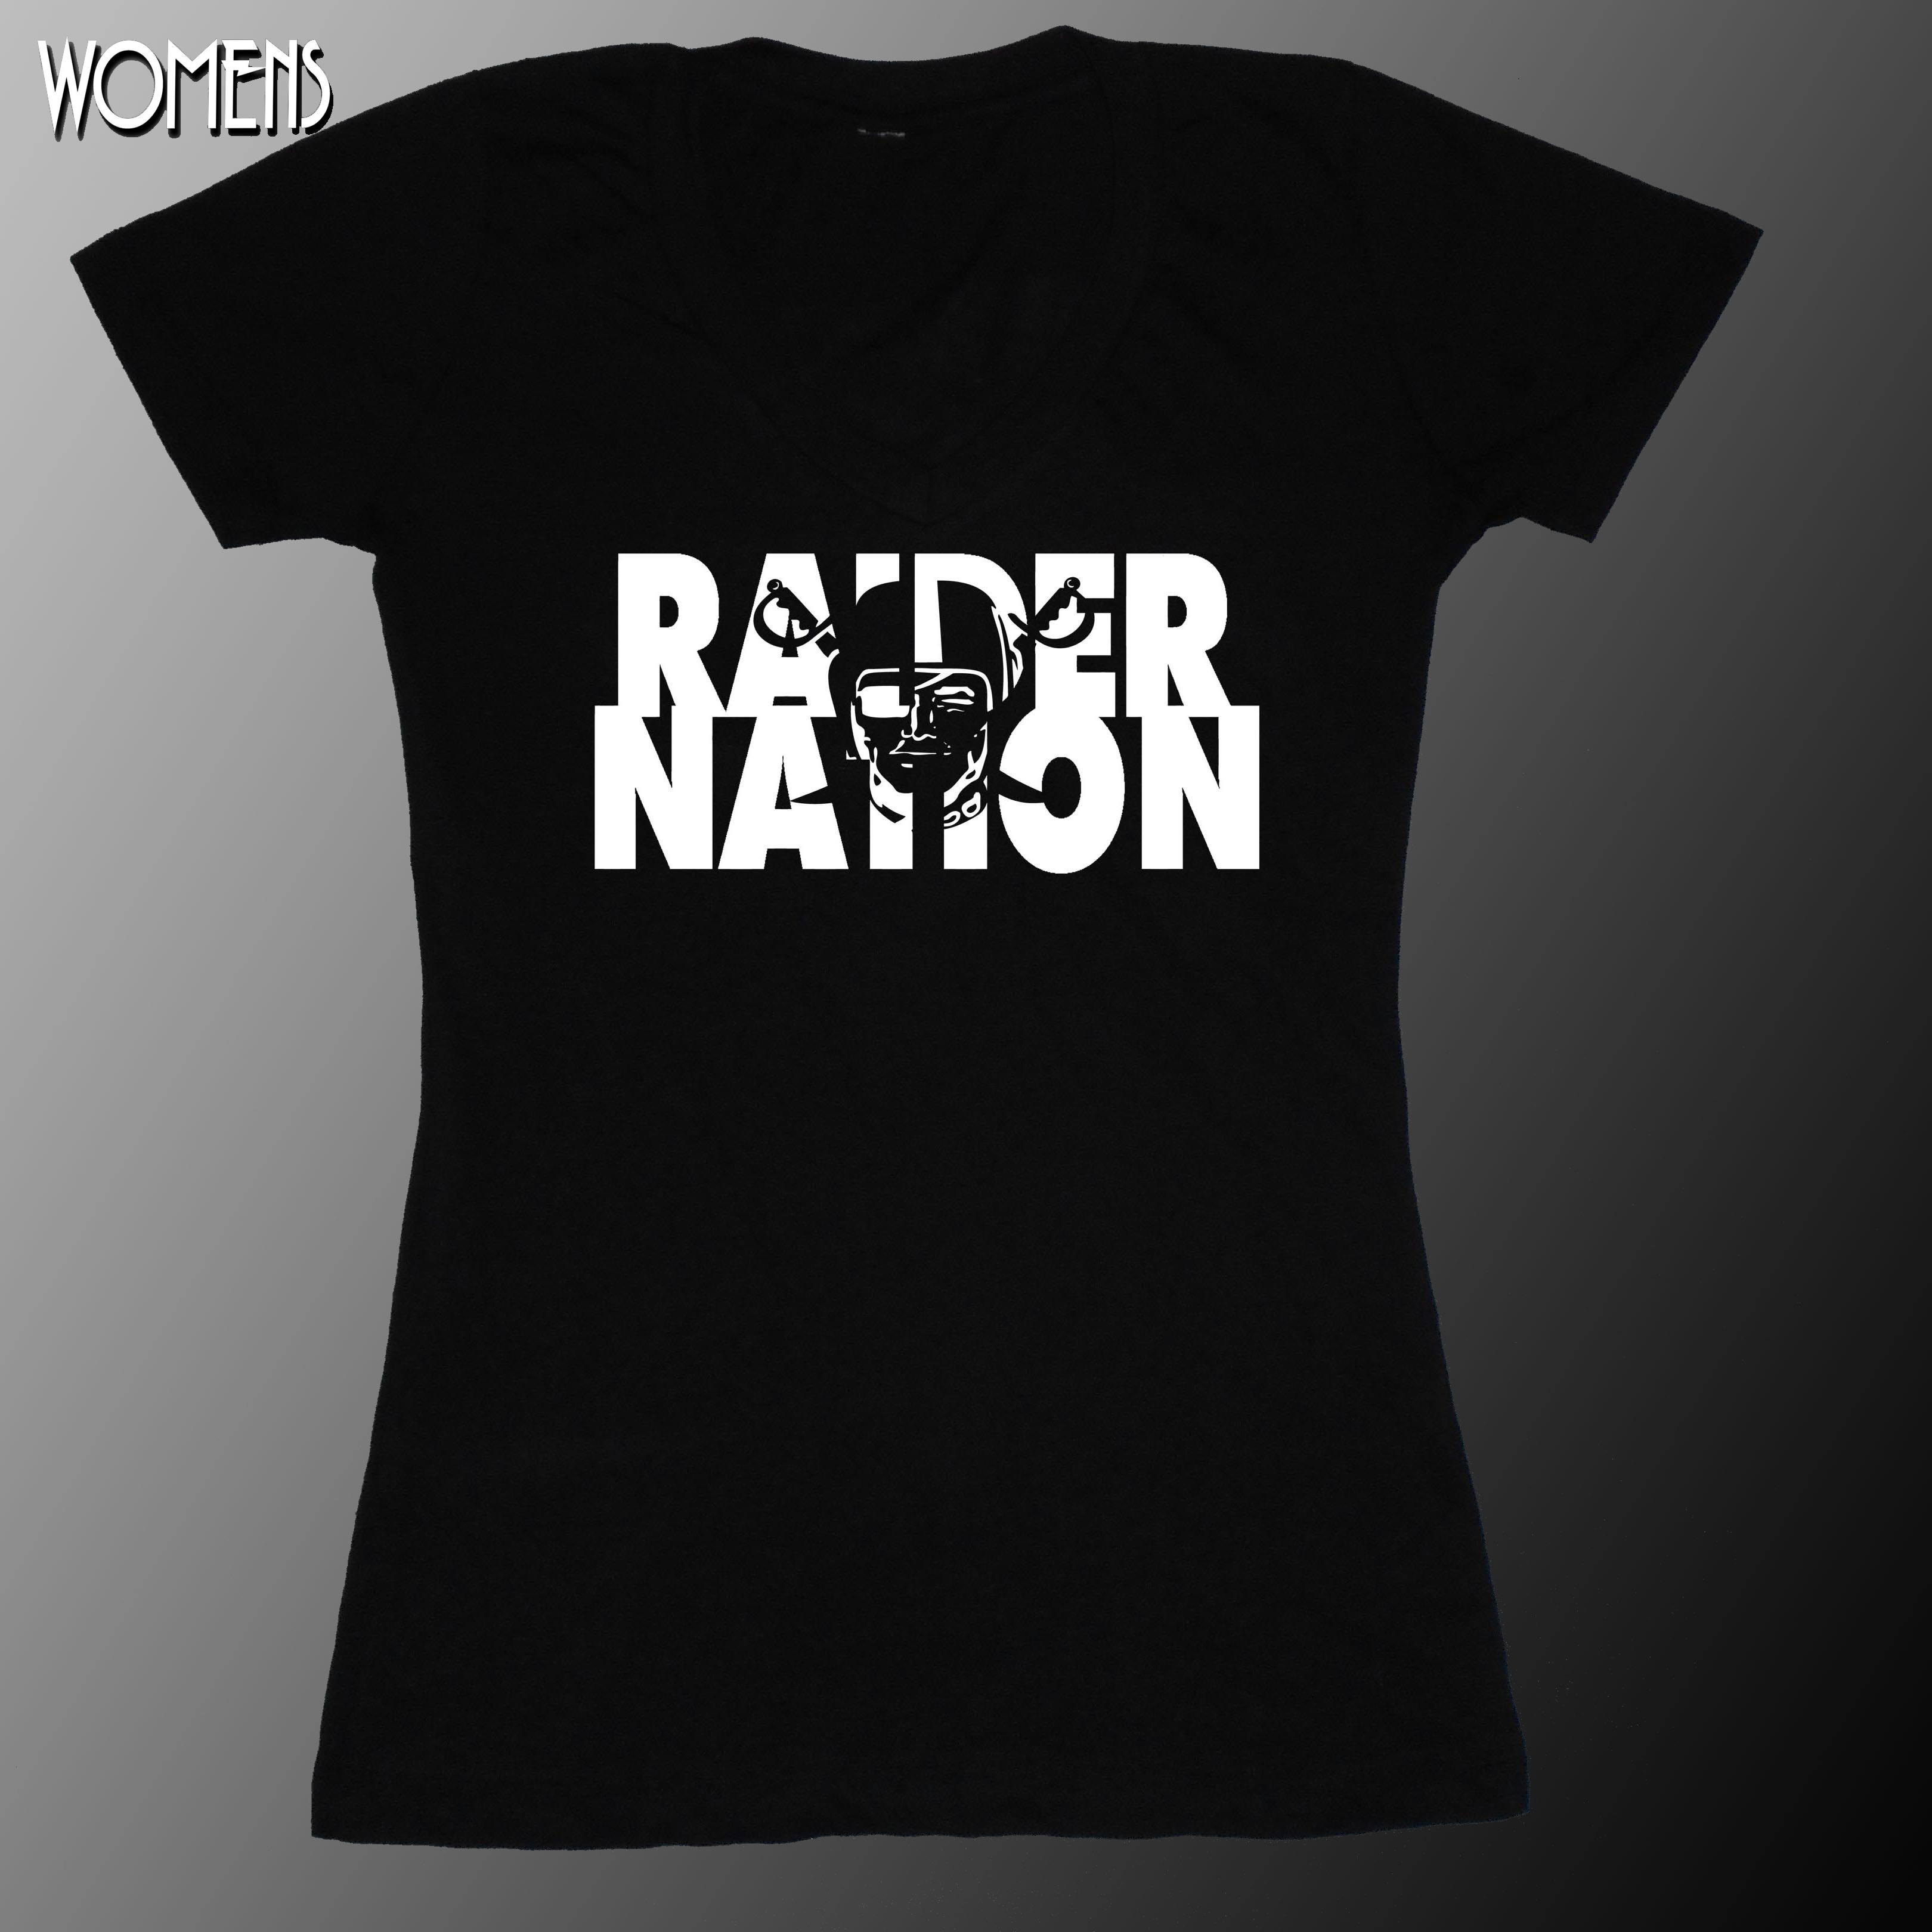 BLACK HOLE APPAREL   Raider Nation   Online Store Powered ...